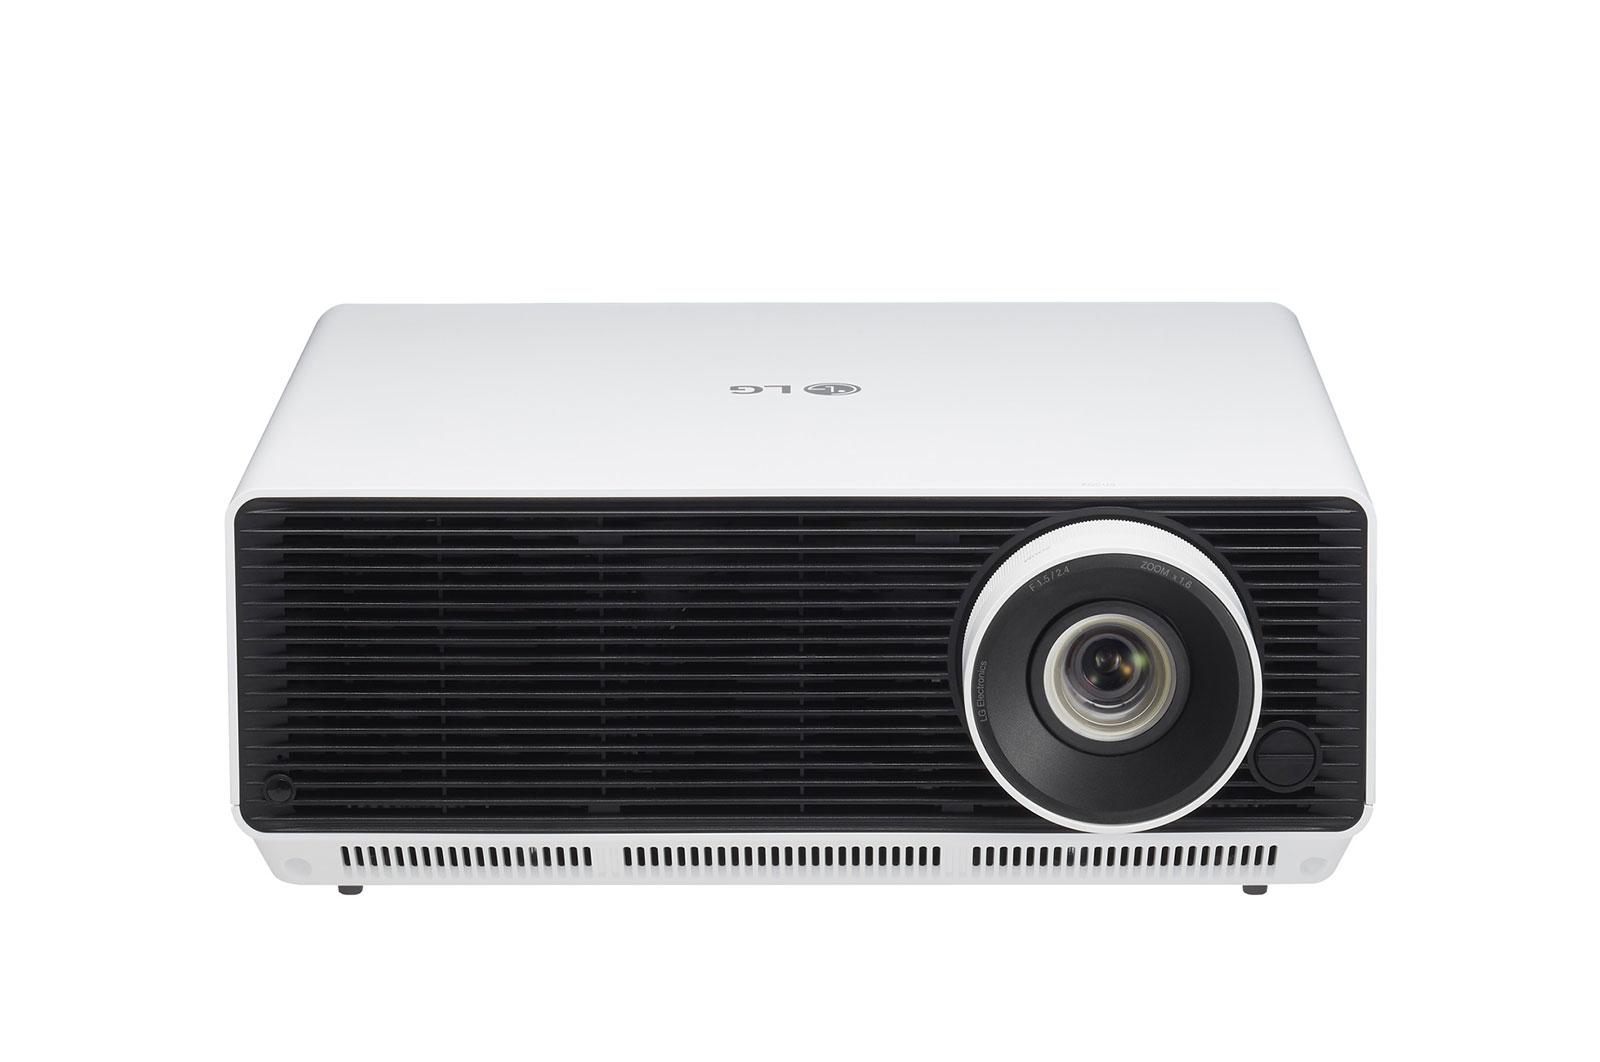 LG BU50NST videoproyector 5000 lúmenes ANSI DLP 2160p (3840x2160) Proyector inteligente Negro, Blanco